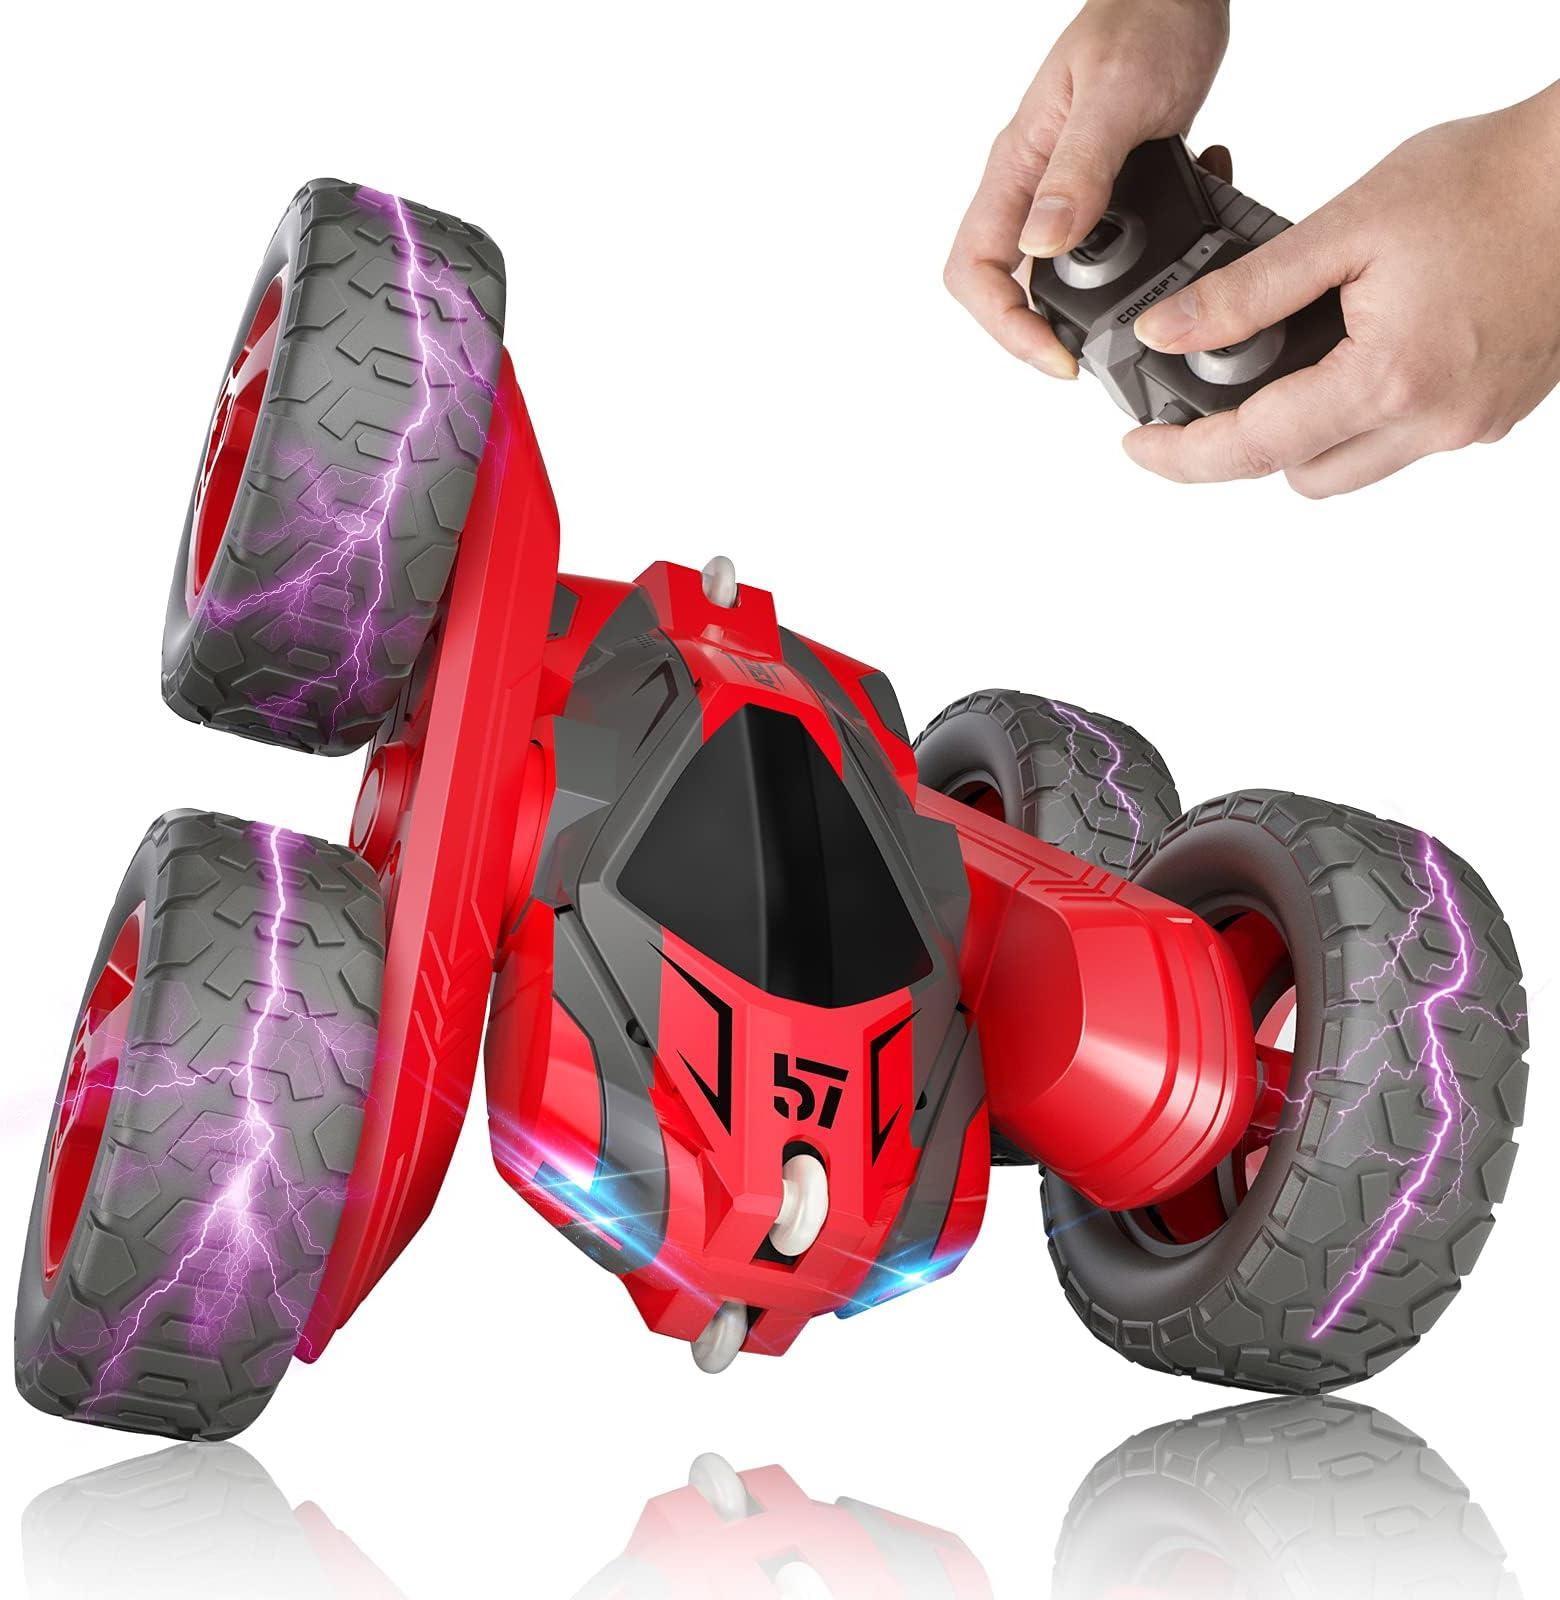 RC Cars Stunt Car 4WD 2.4GHz Double Sided Rotating 360° Fli Remote Control Car